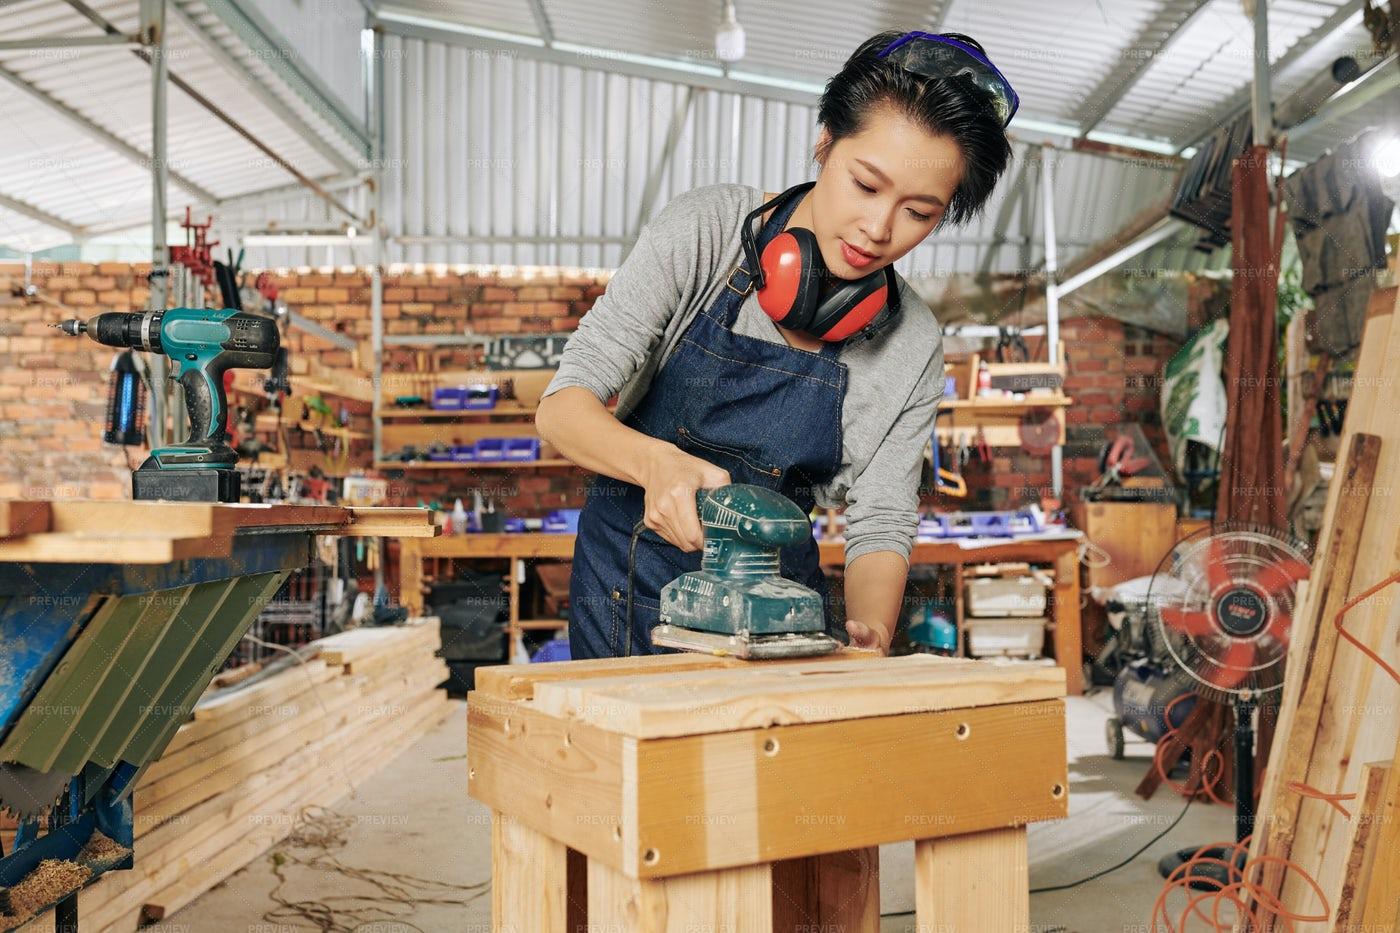 Carpenter Polishing Wooden Surface: Stock Photos